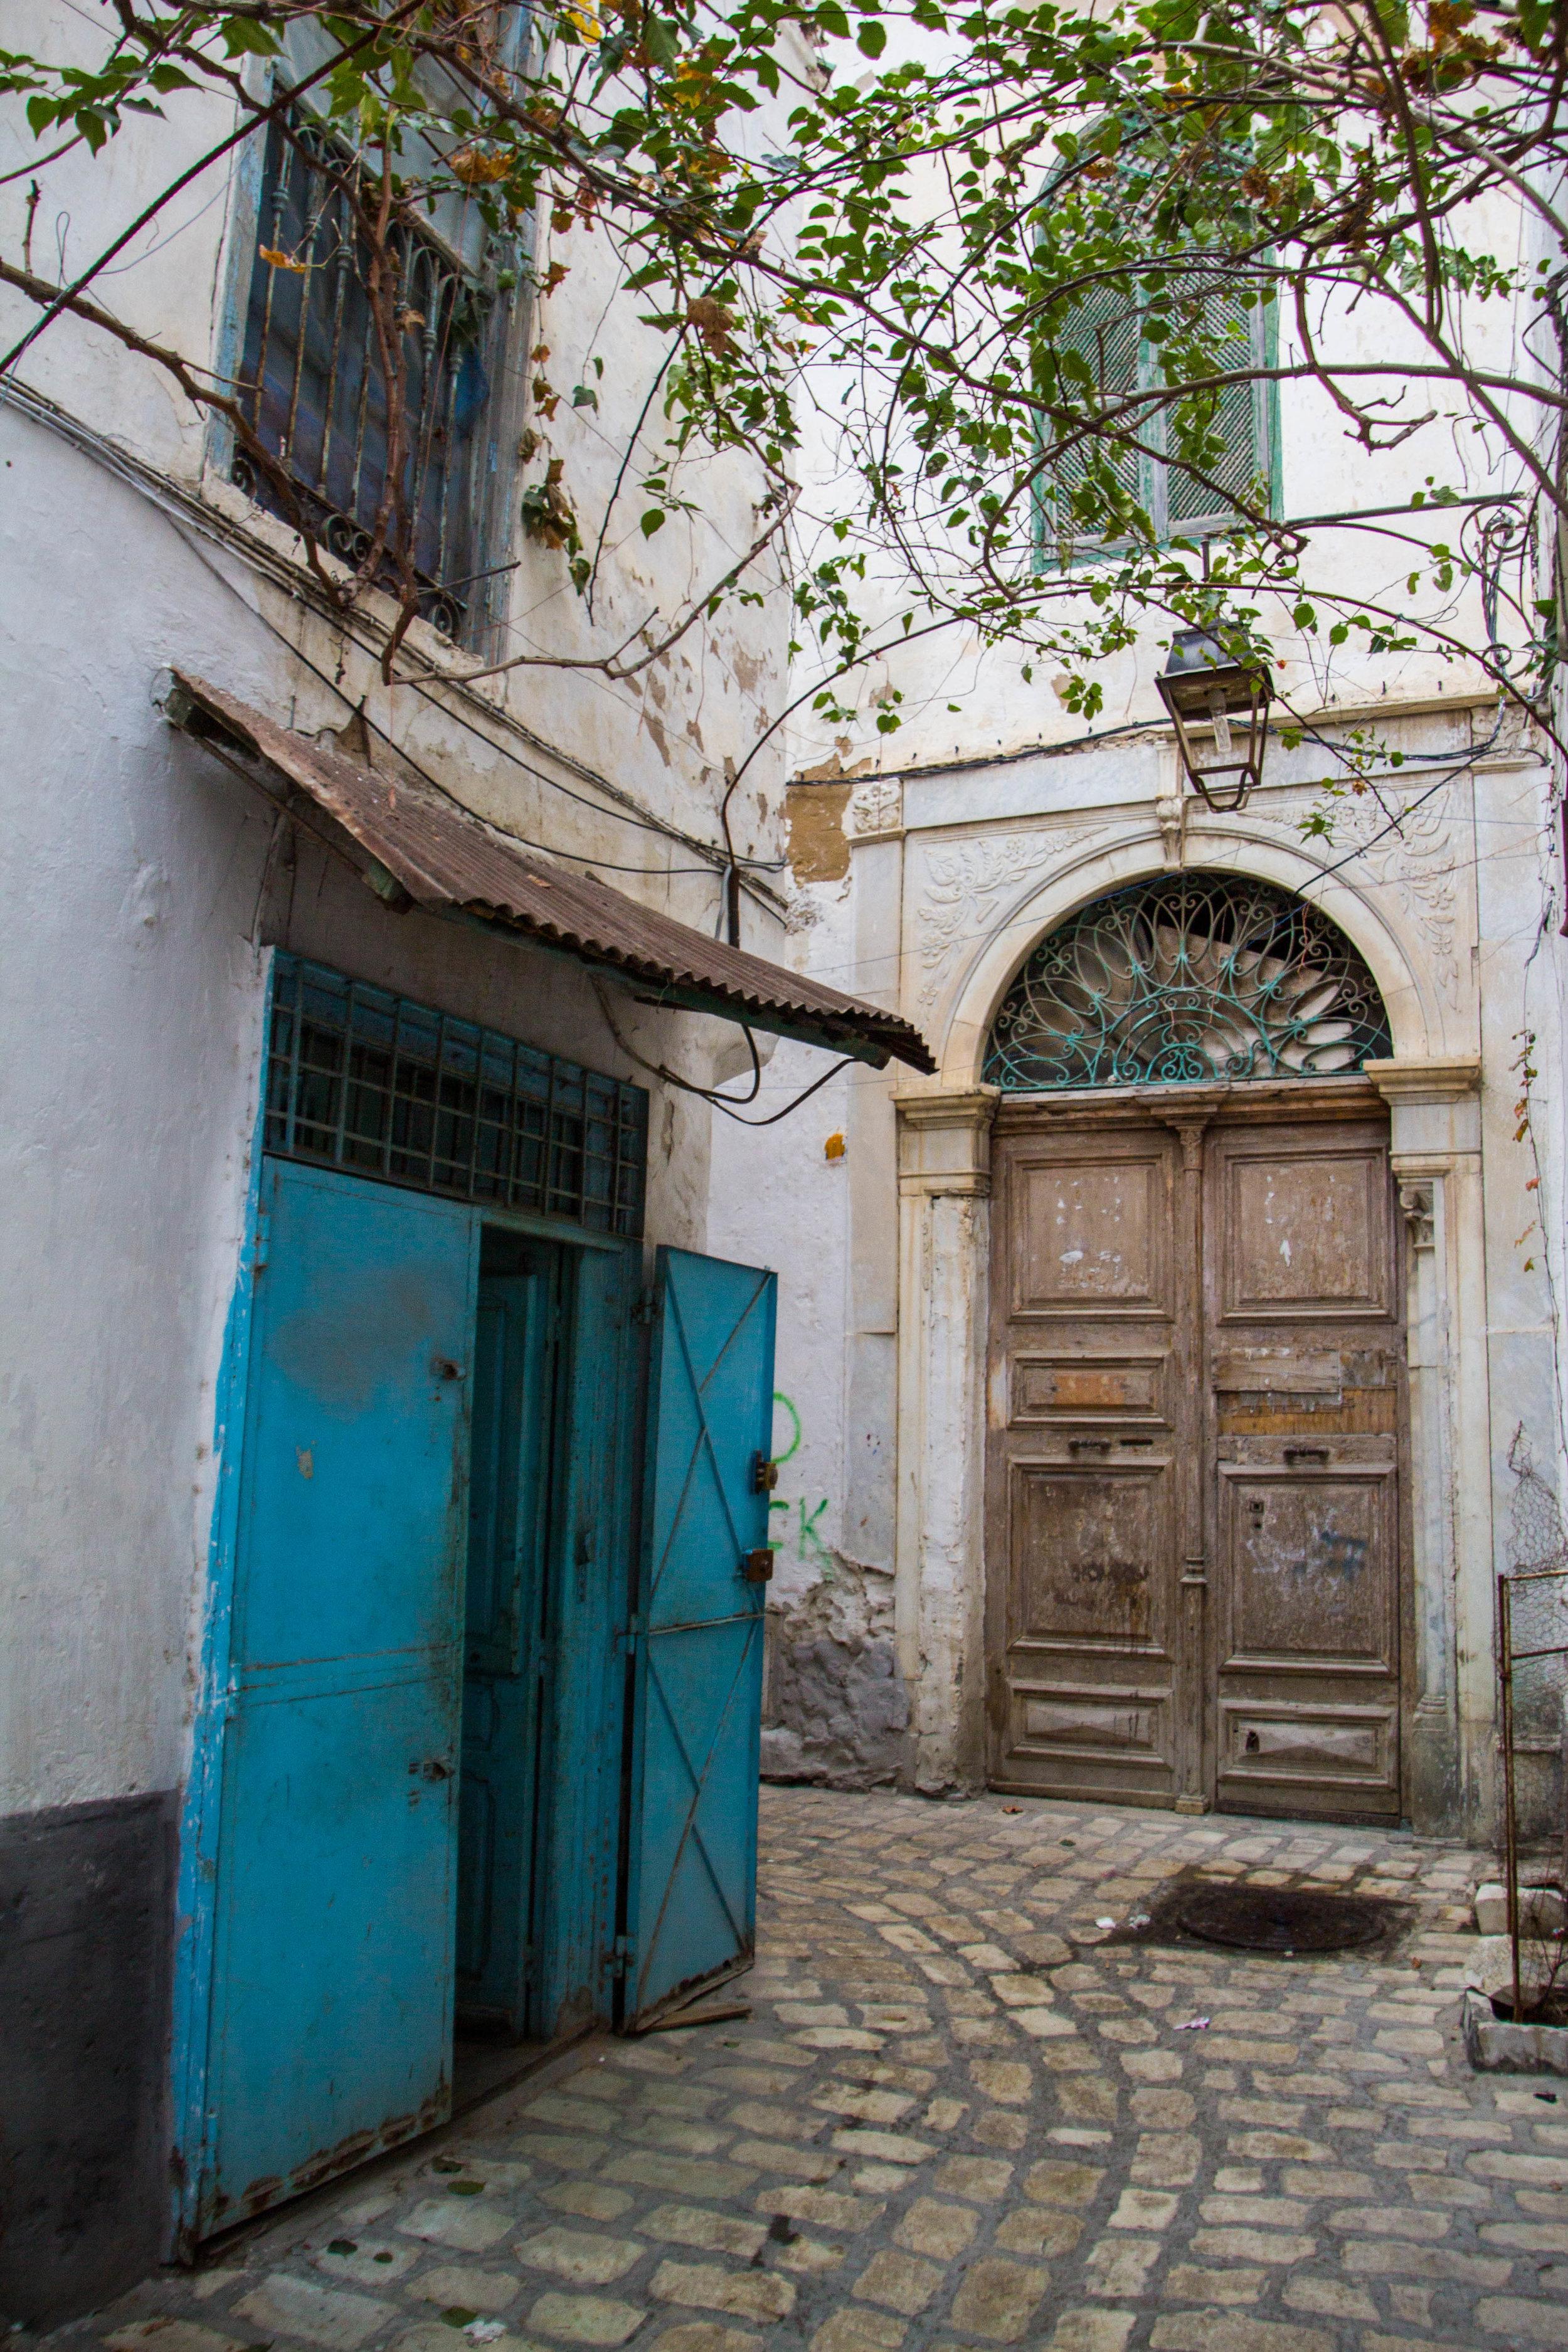 medina-photography-tunis-tunisia-49.jpg